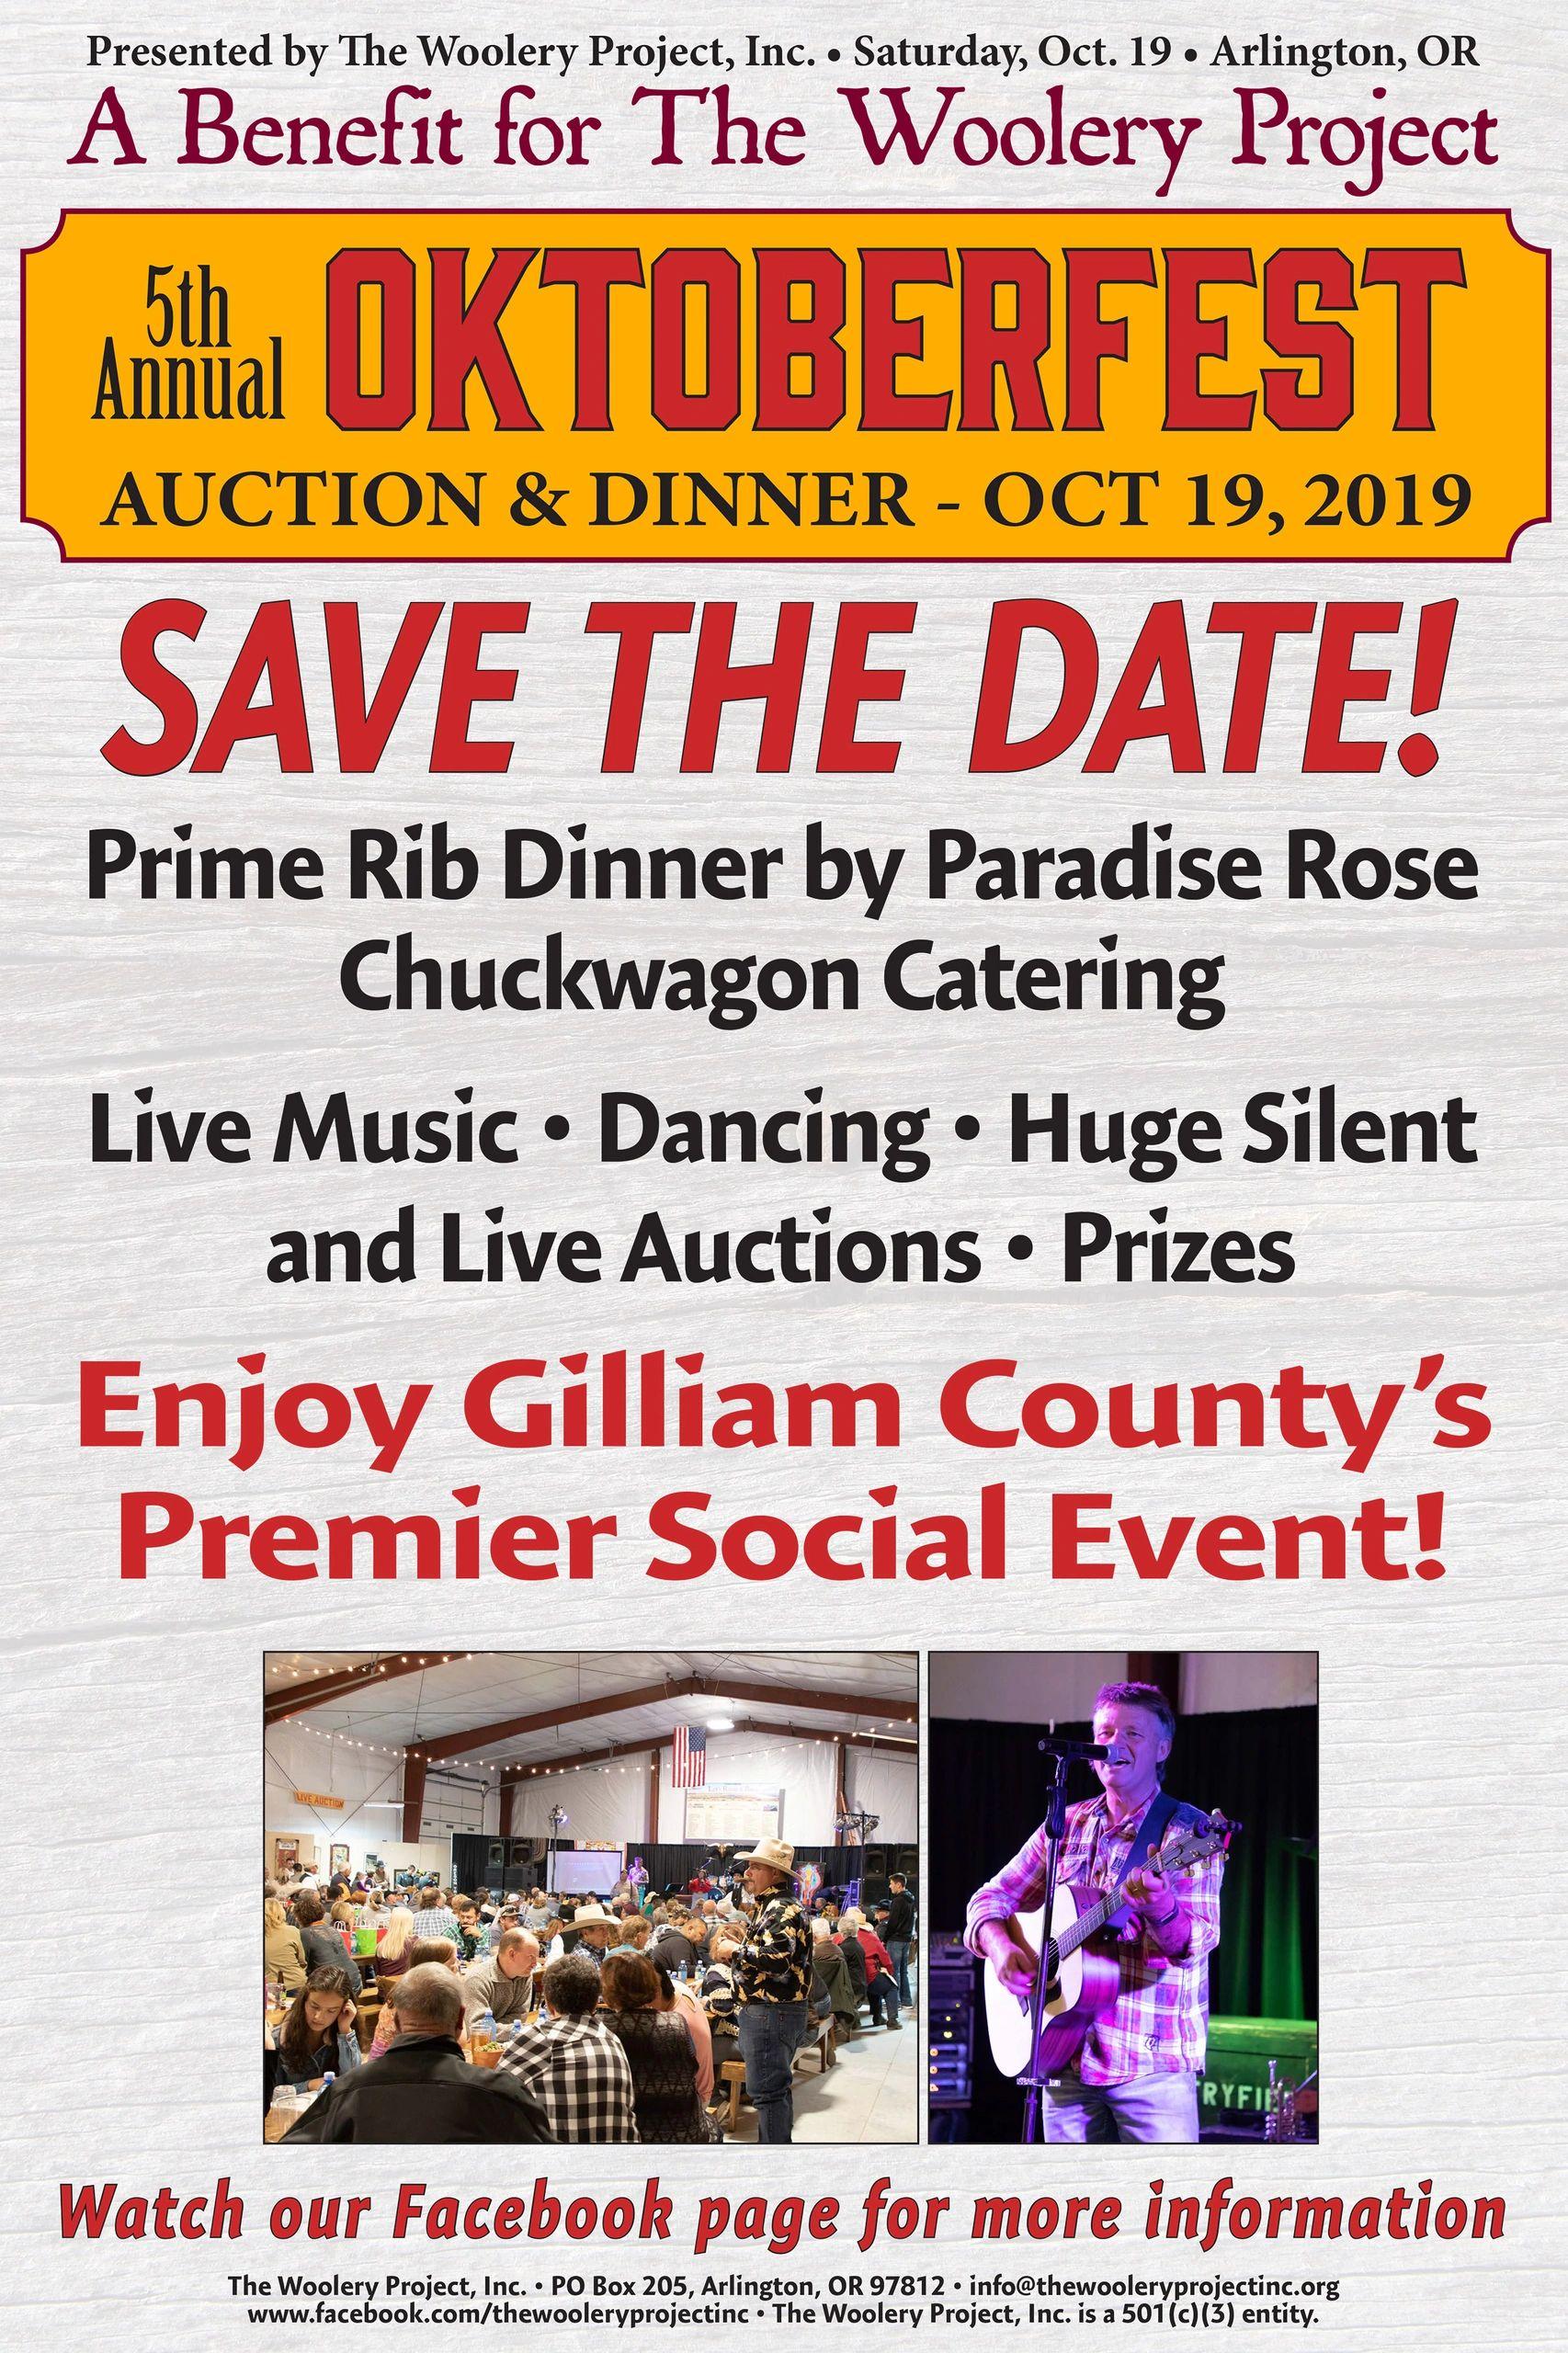 2019 Oktoberfest Auction   The Woolery Project, Inc